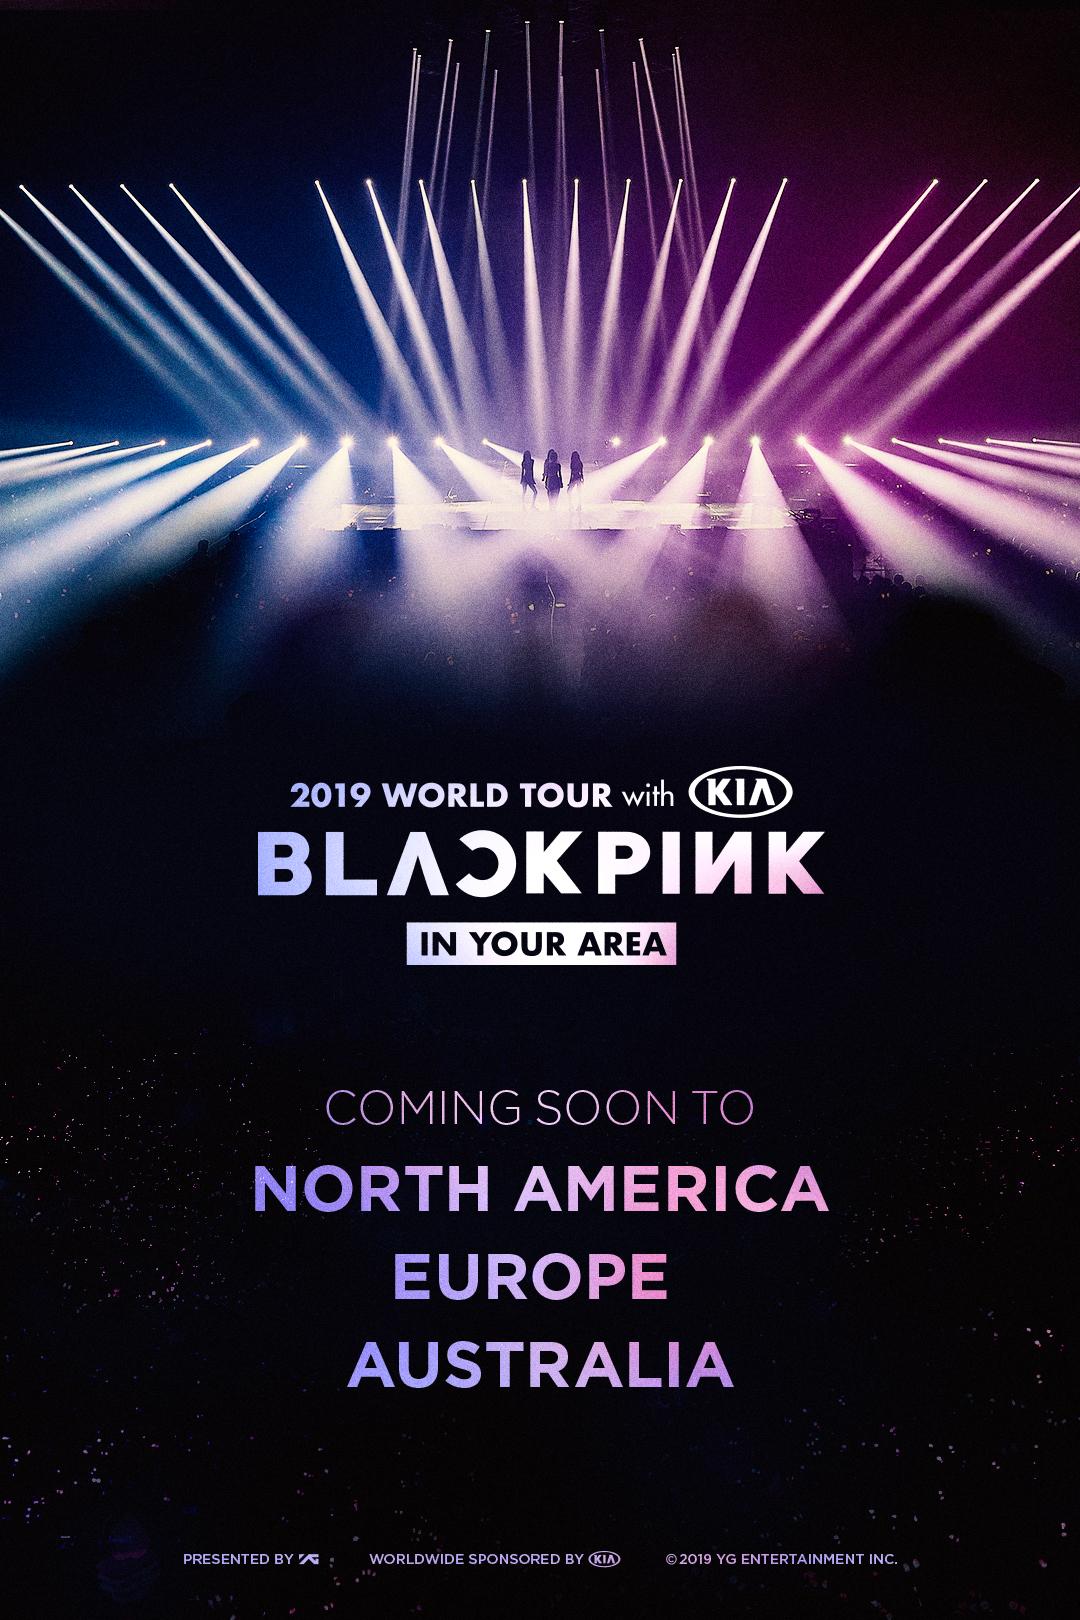 BLACKPINK_2019worldtour_POSTER